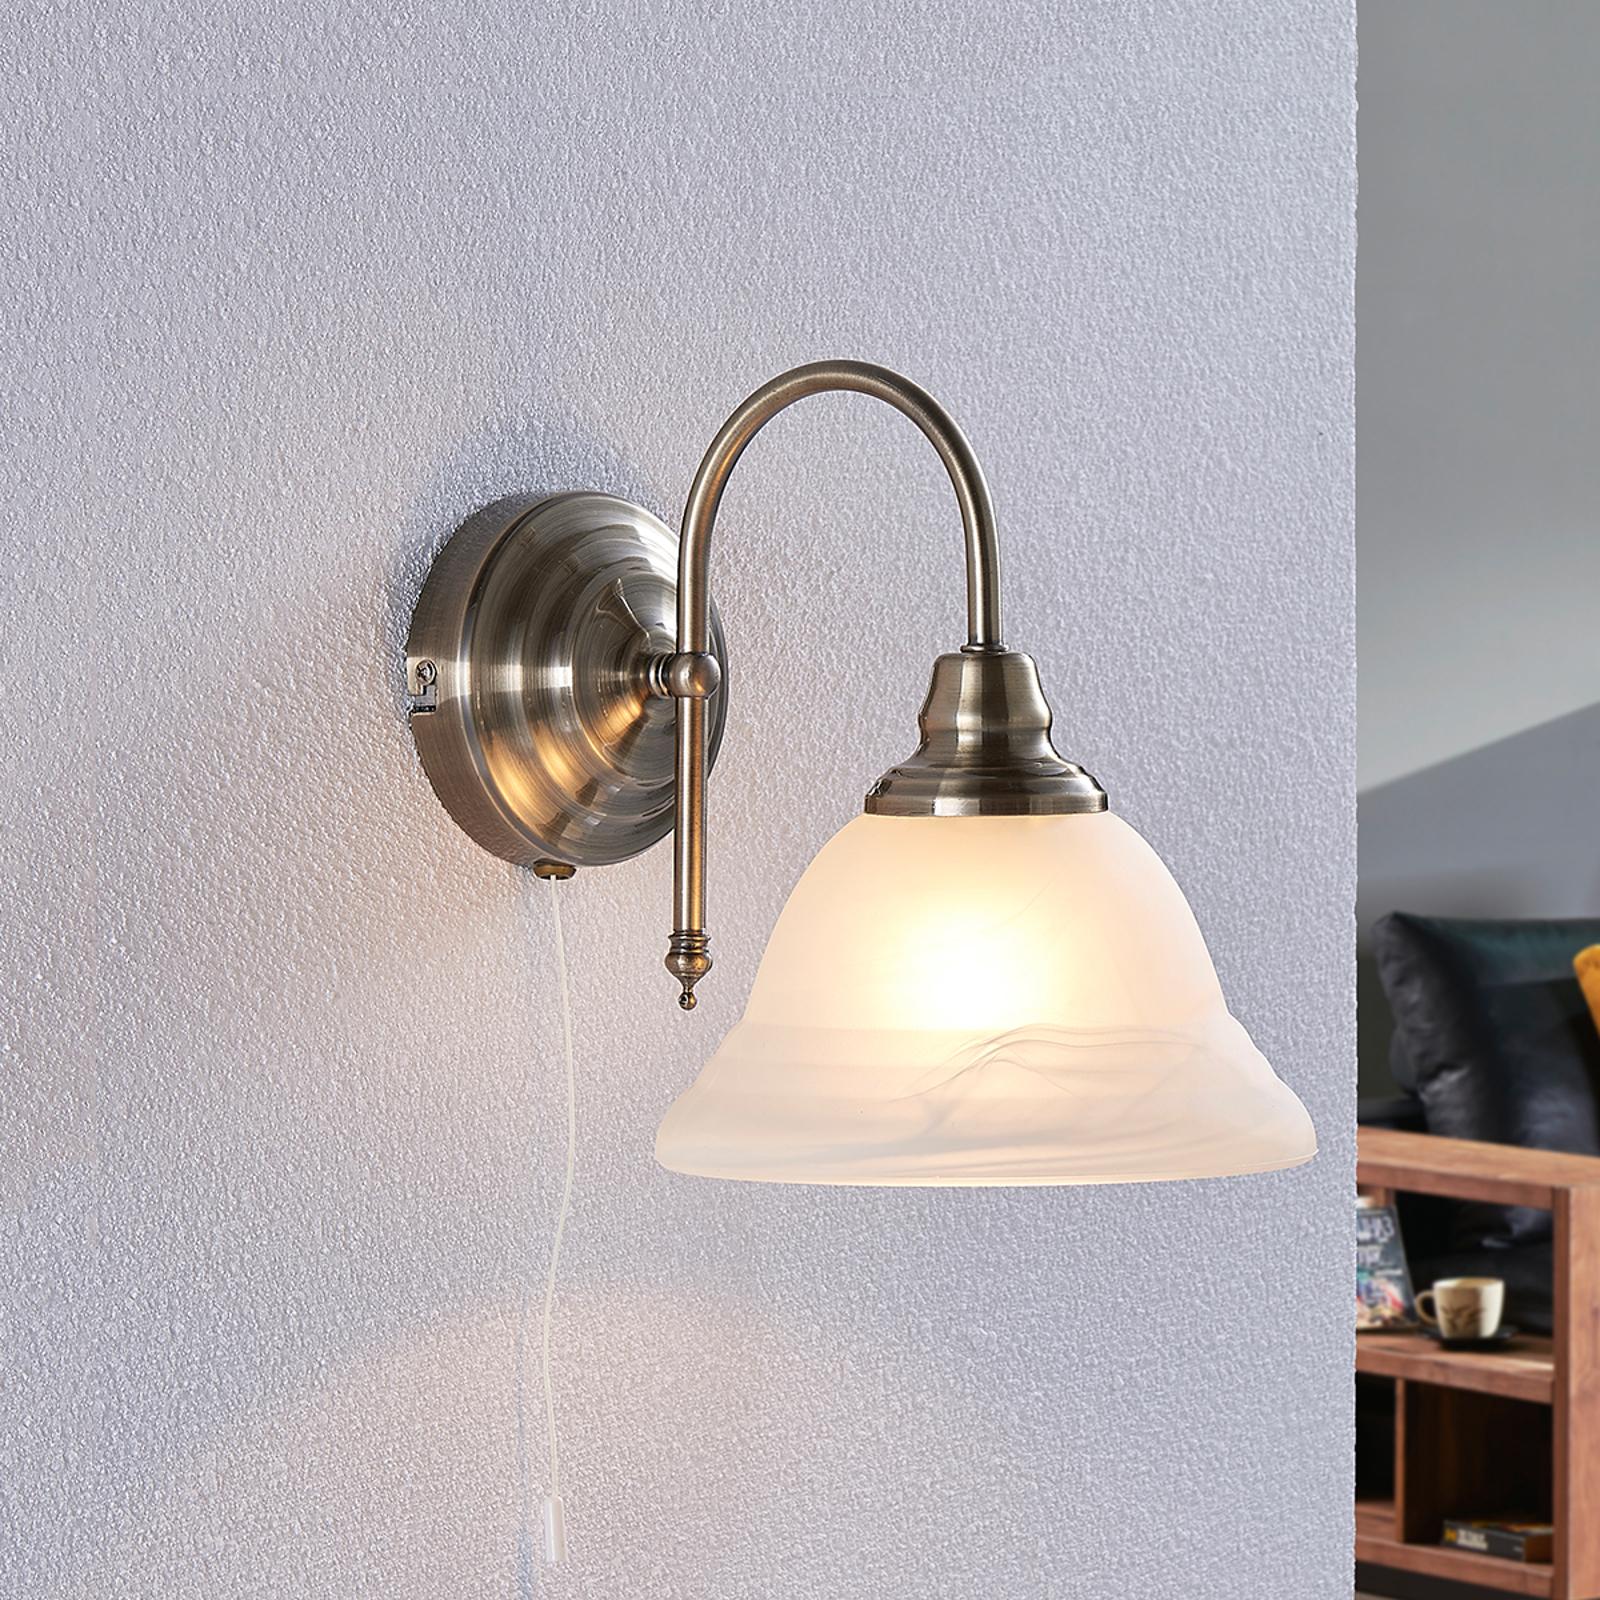 Antiek ogende wandlamp Hanna